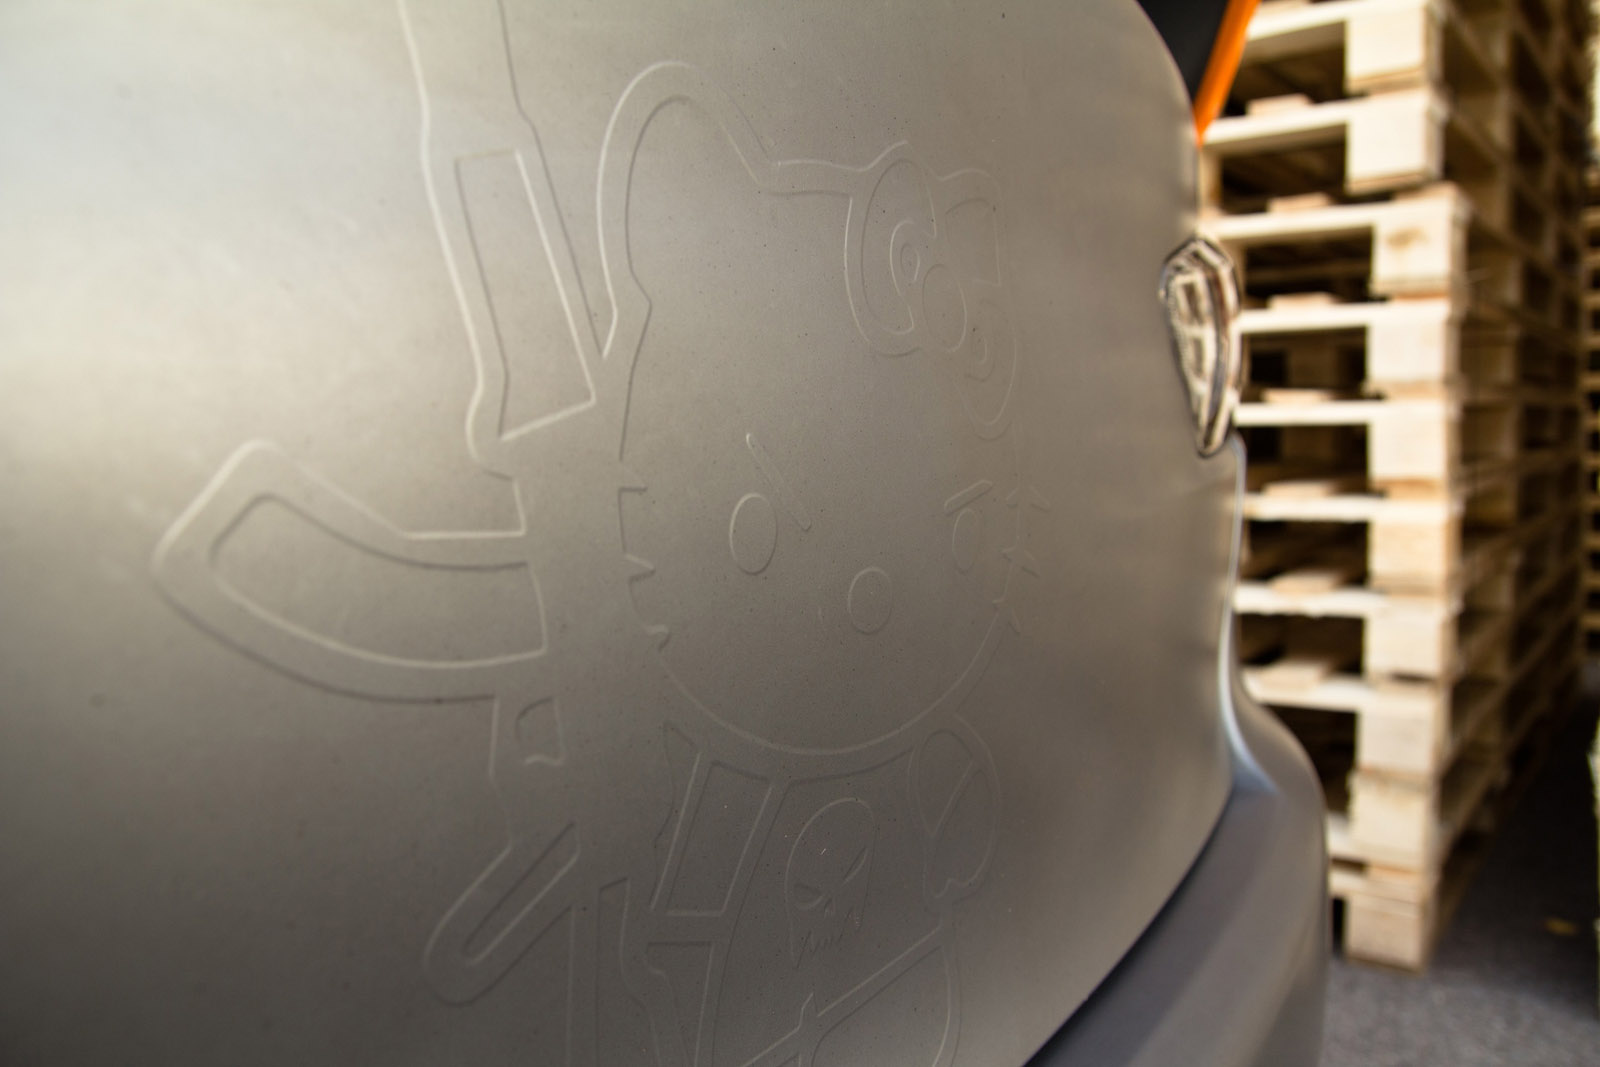 SchwabenFolia Mitsubishi Evo X STEALTH FIGHTER